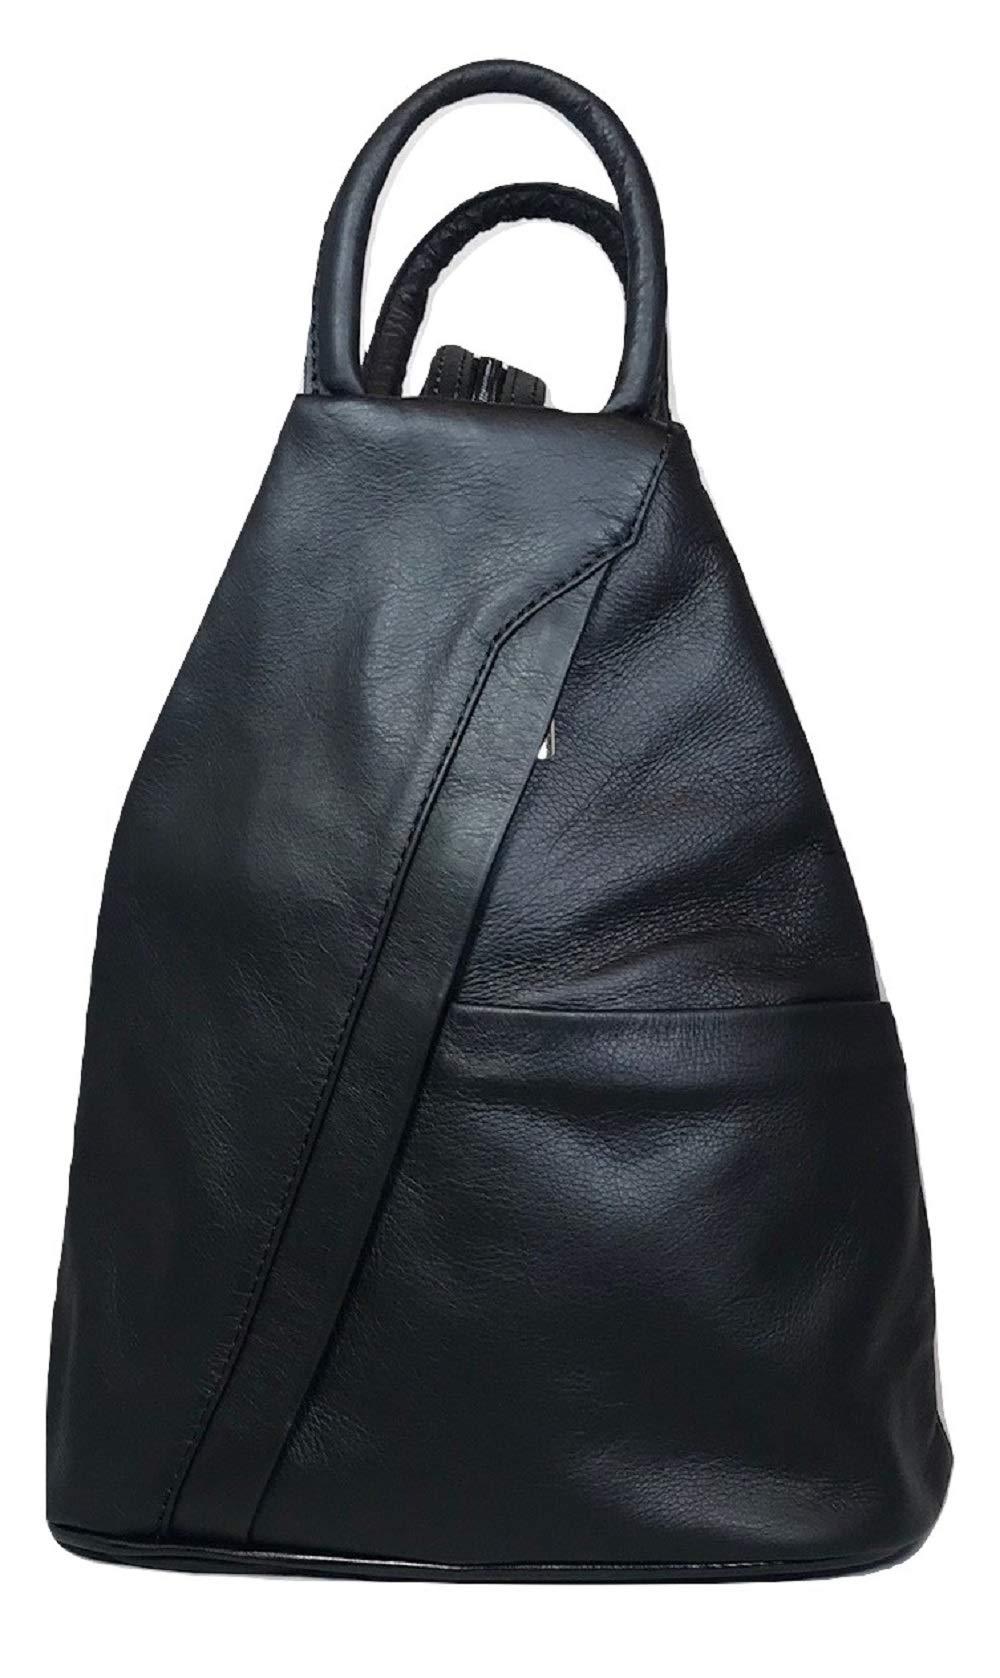 LaGaksta Submedium Backpack Convertible Teardrop Italian Leather Bag Purse Small Black